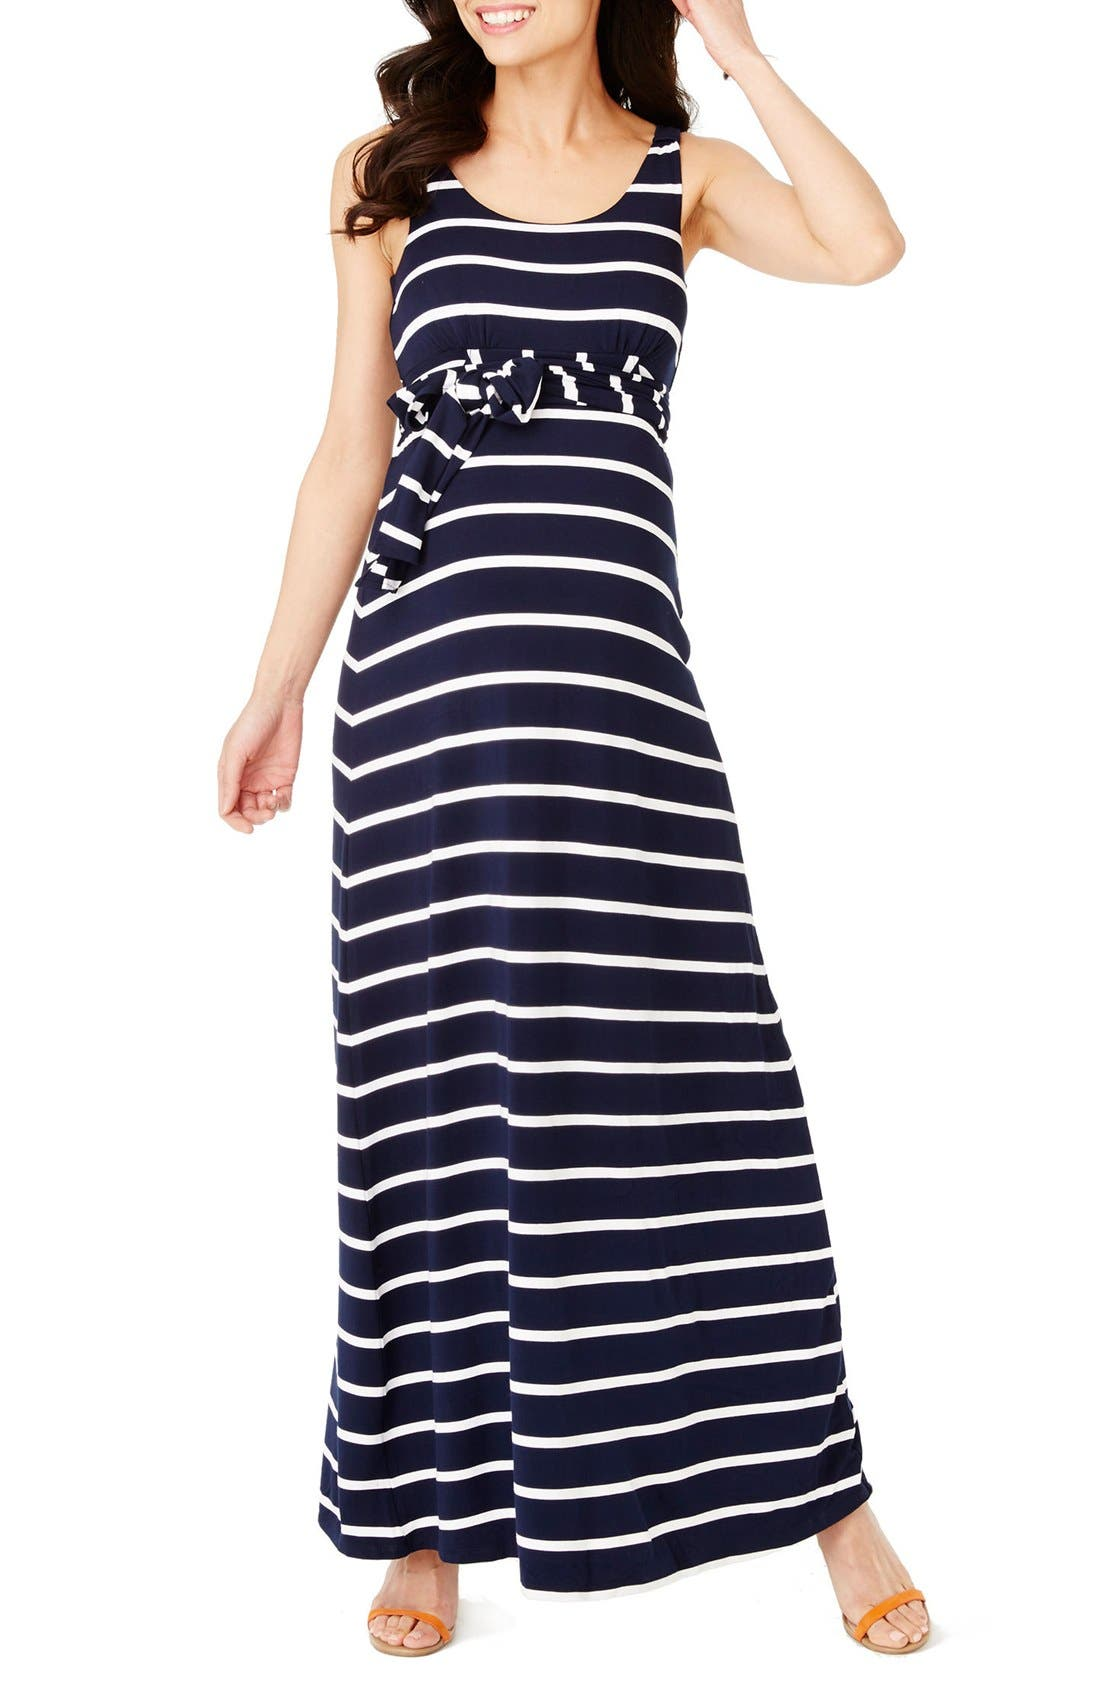 'Kendal' Stripe Maternity Maxi Dress,                         Main,                         color, Navy White Stripe